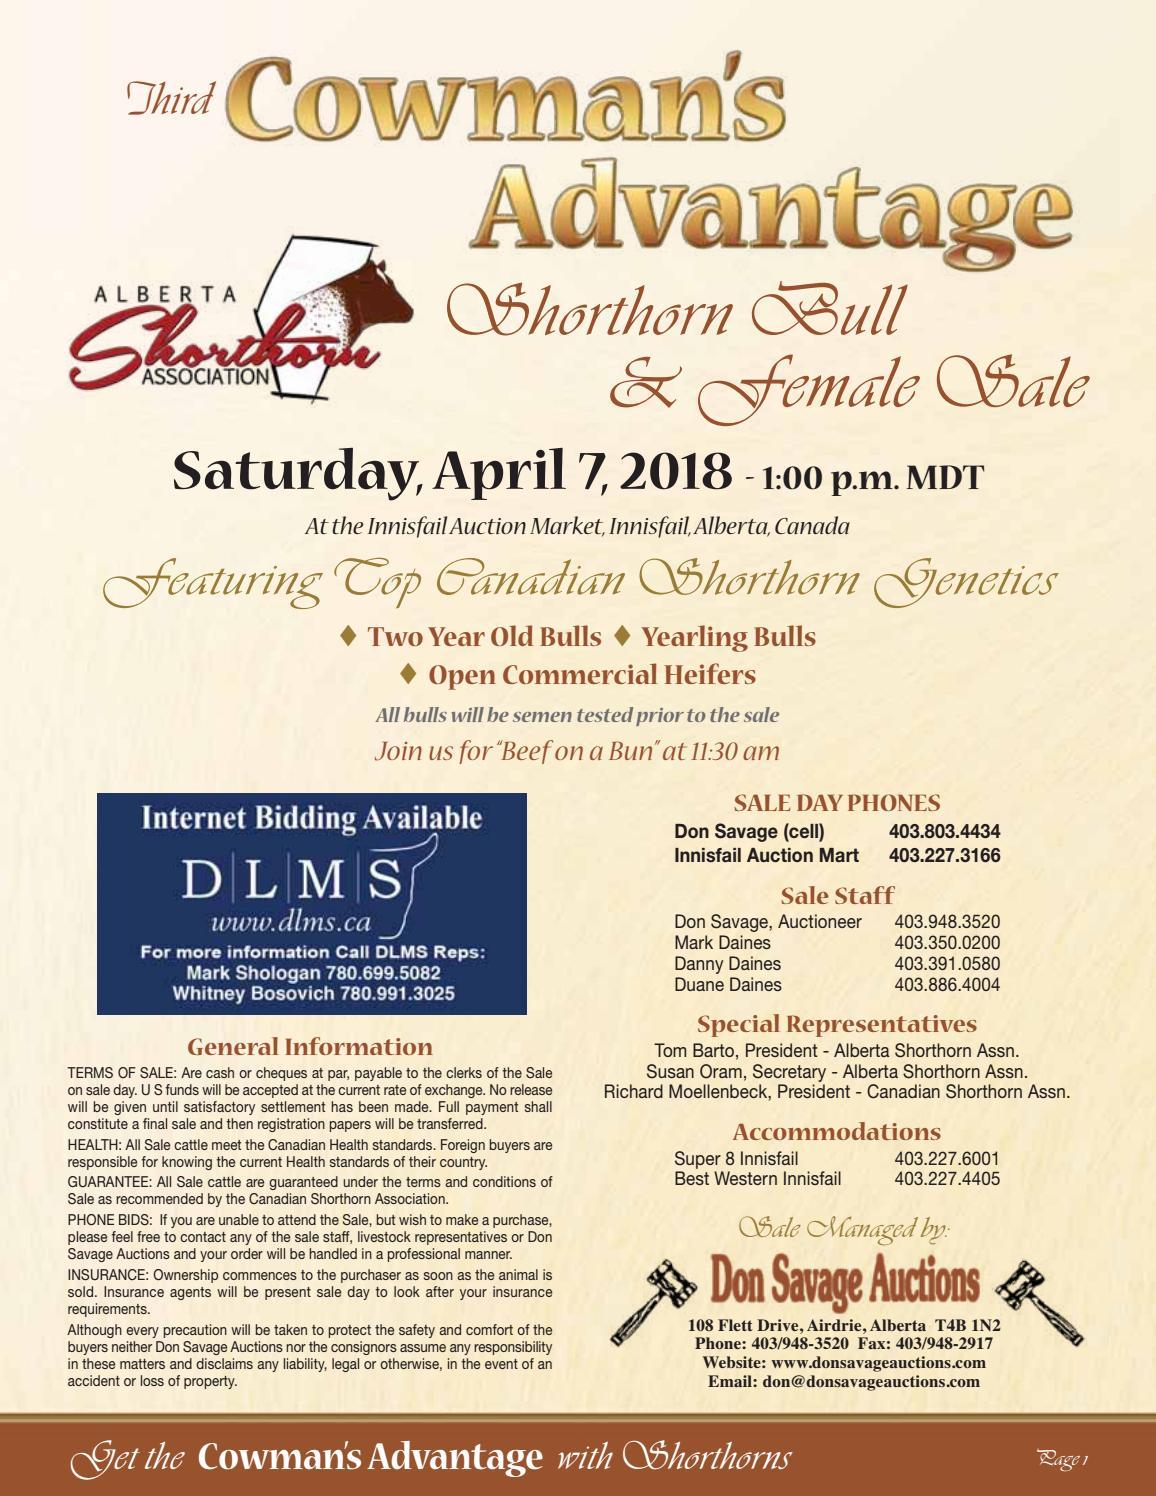 5667e8e237 Cowman's Advantage Shorthorn Bull & Female Sale 2018 by Everything Angus -  issuu